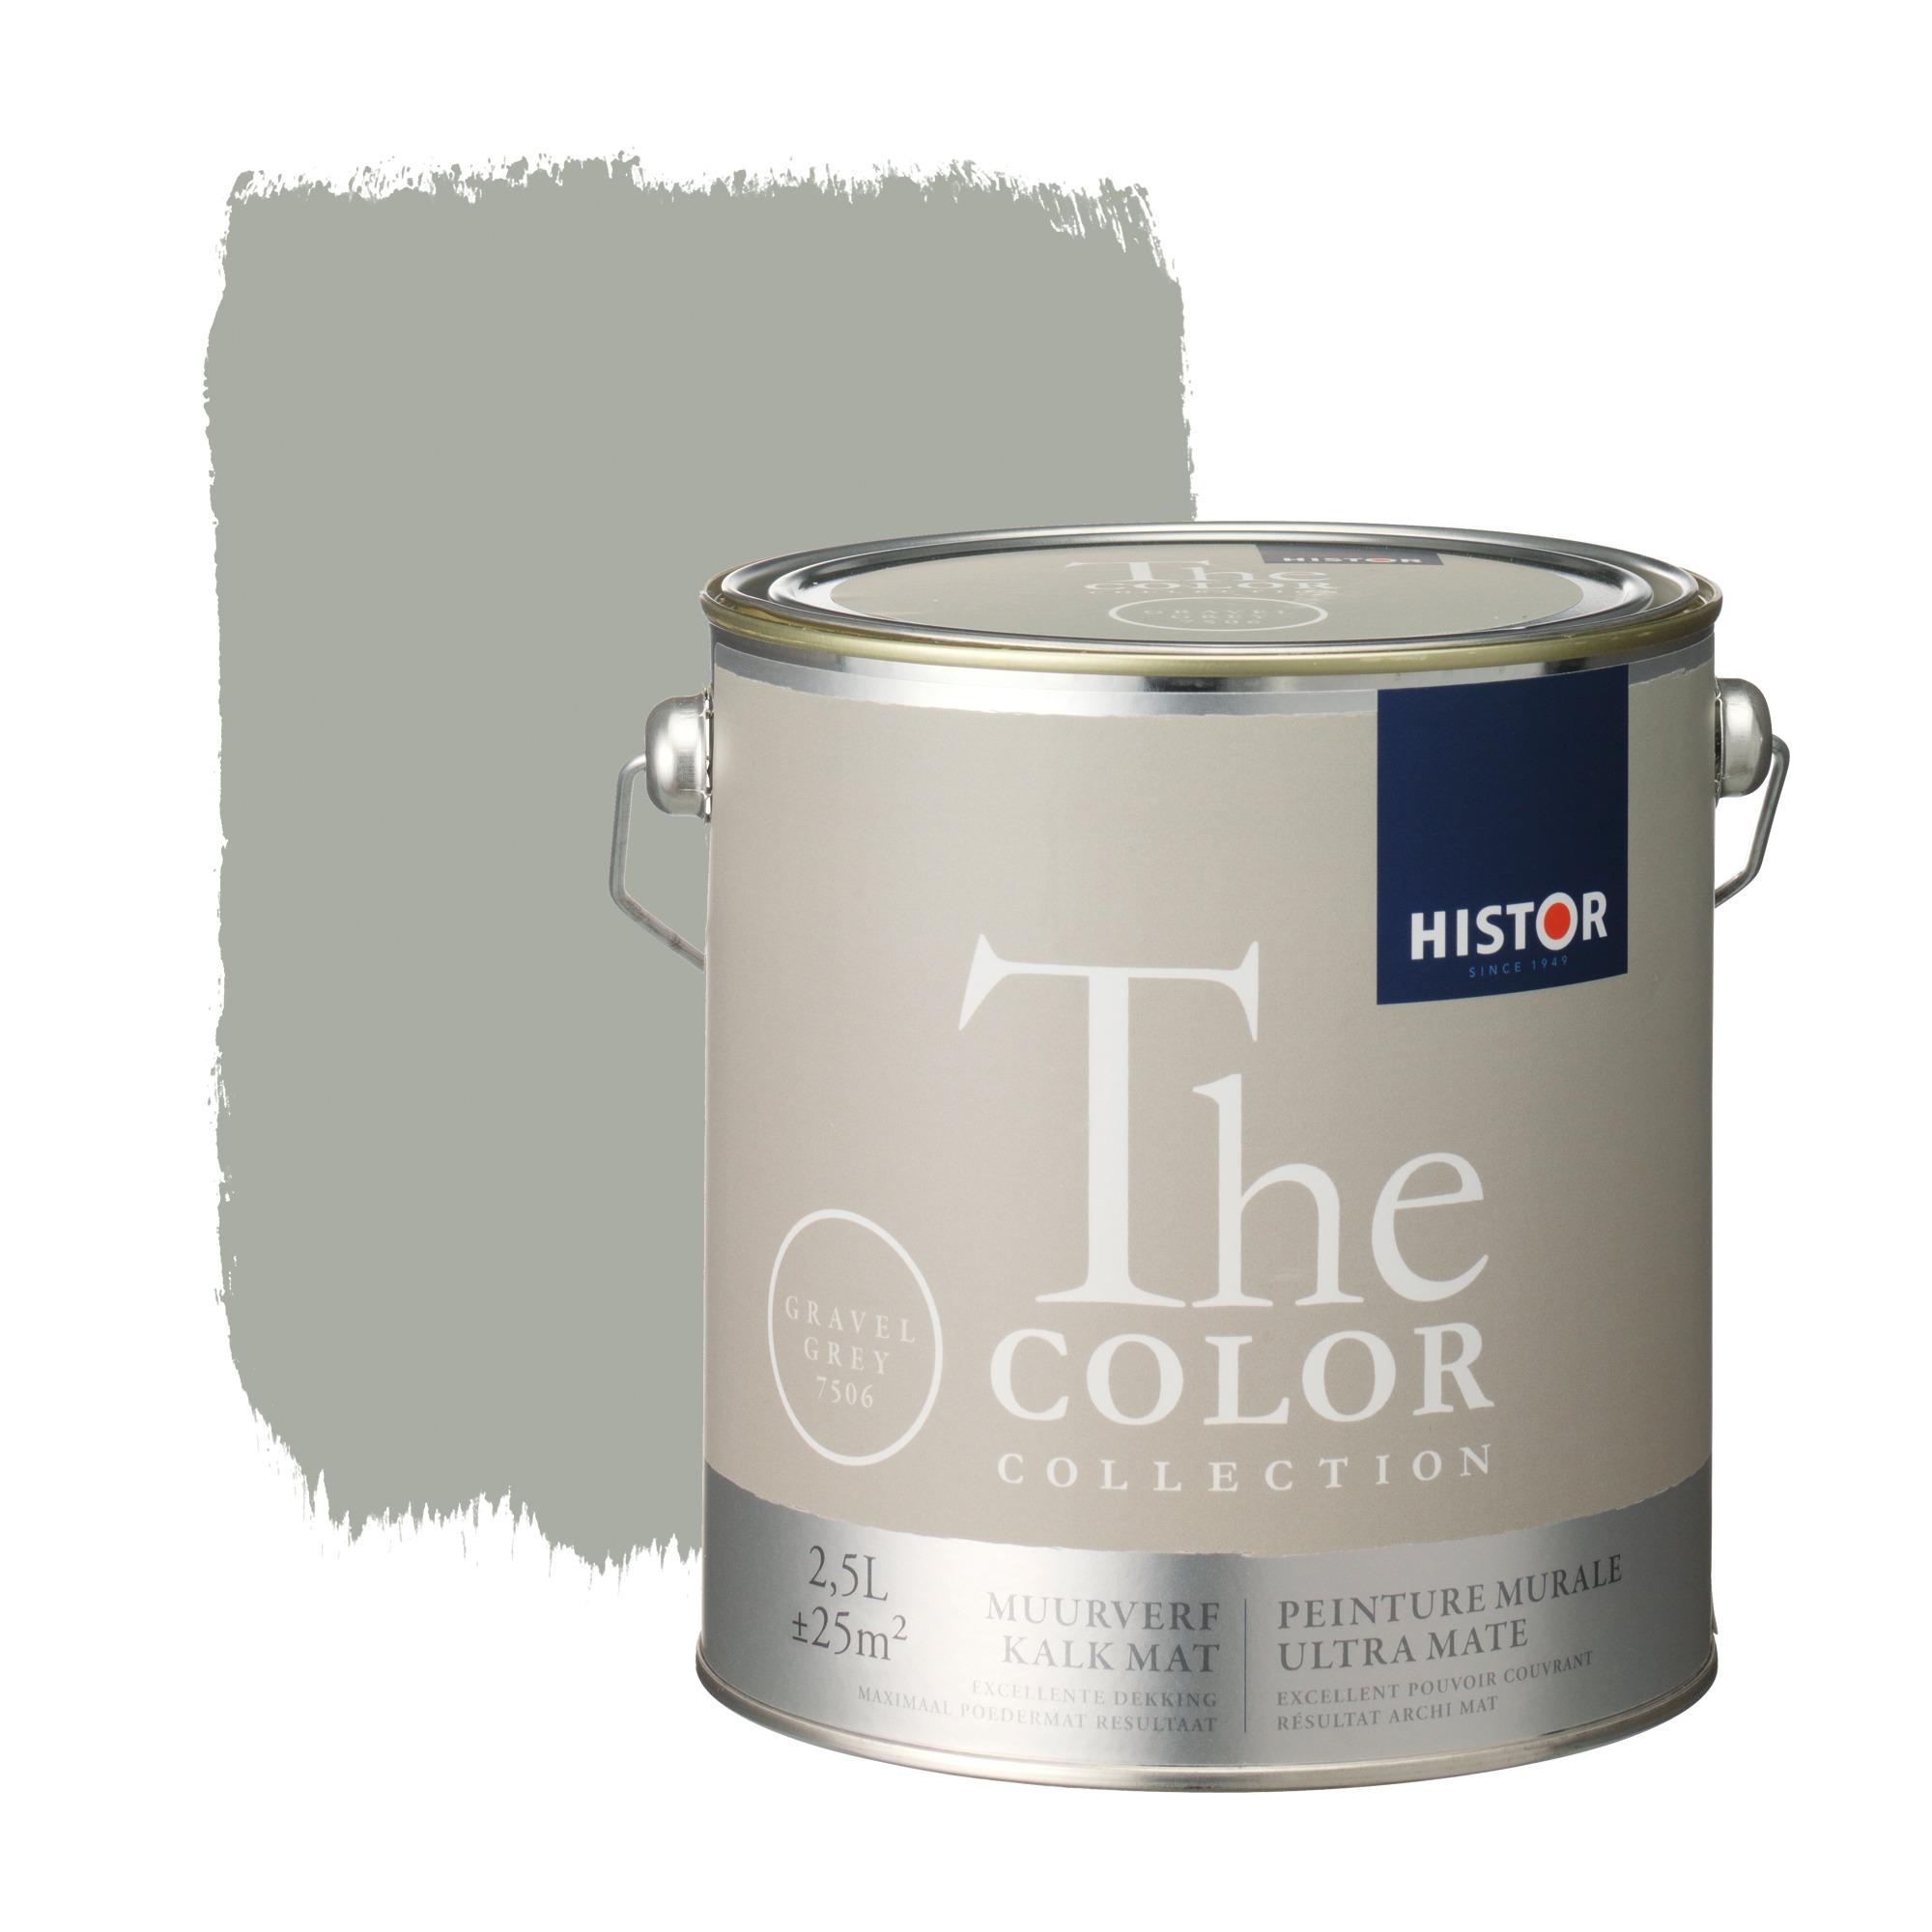 Histor the color collection muurverf kalkmat gravel grey 7506 2,5 l